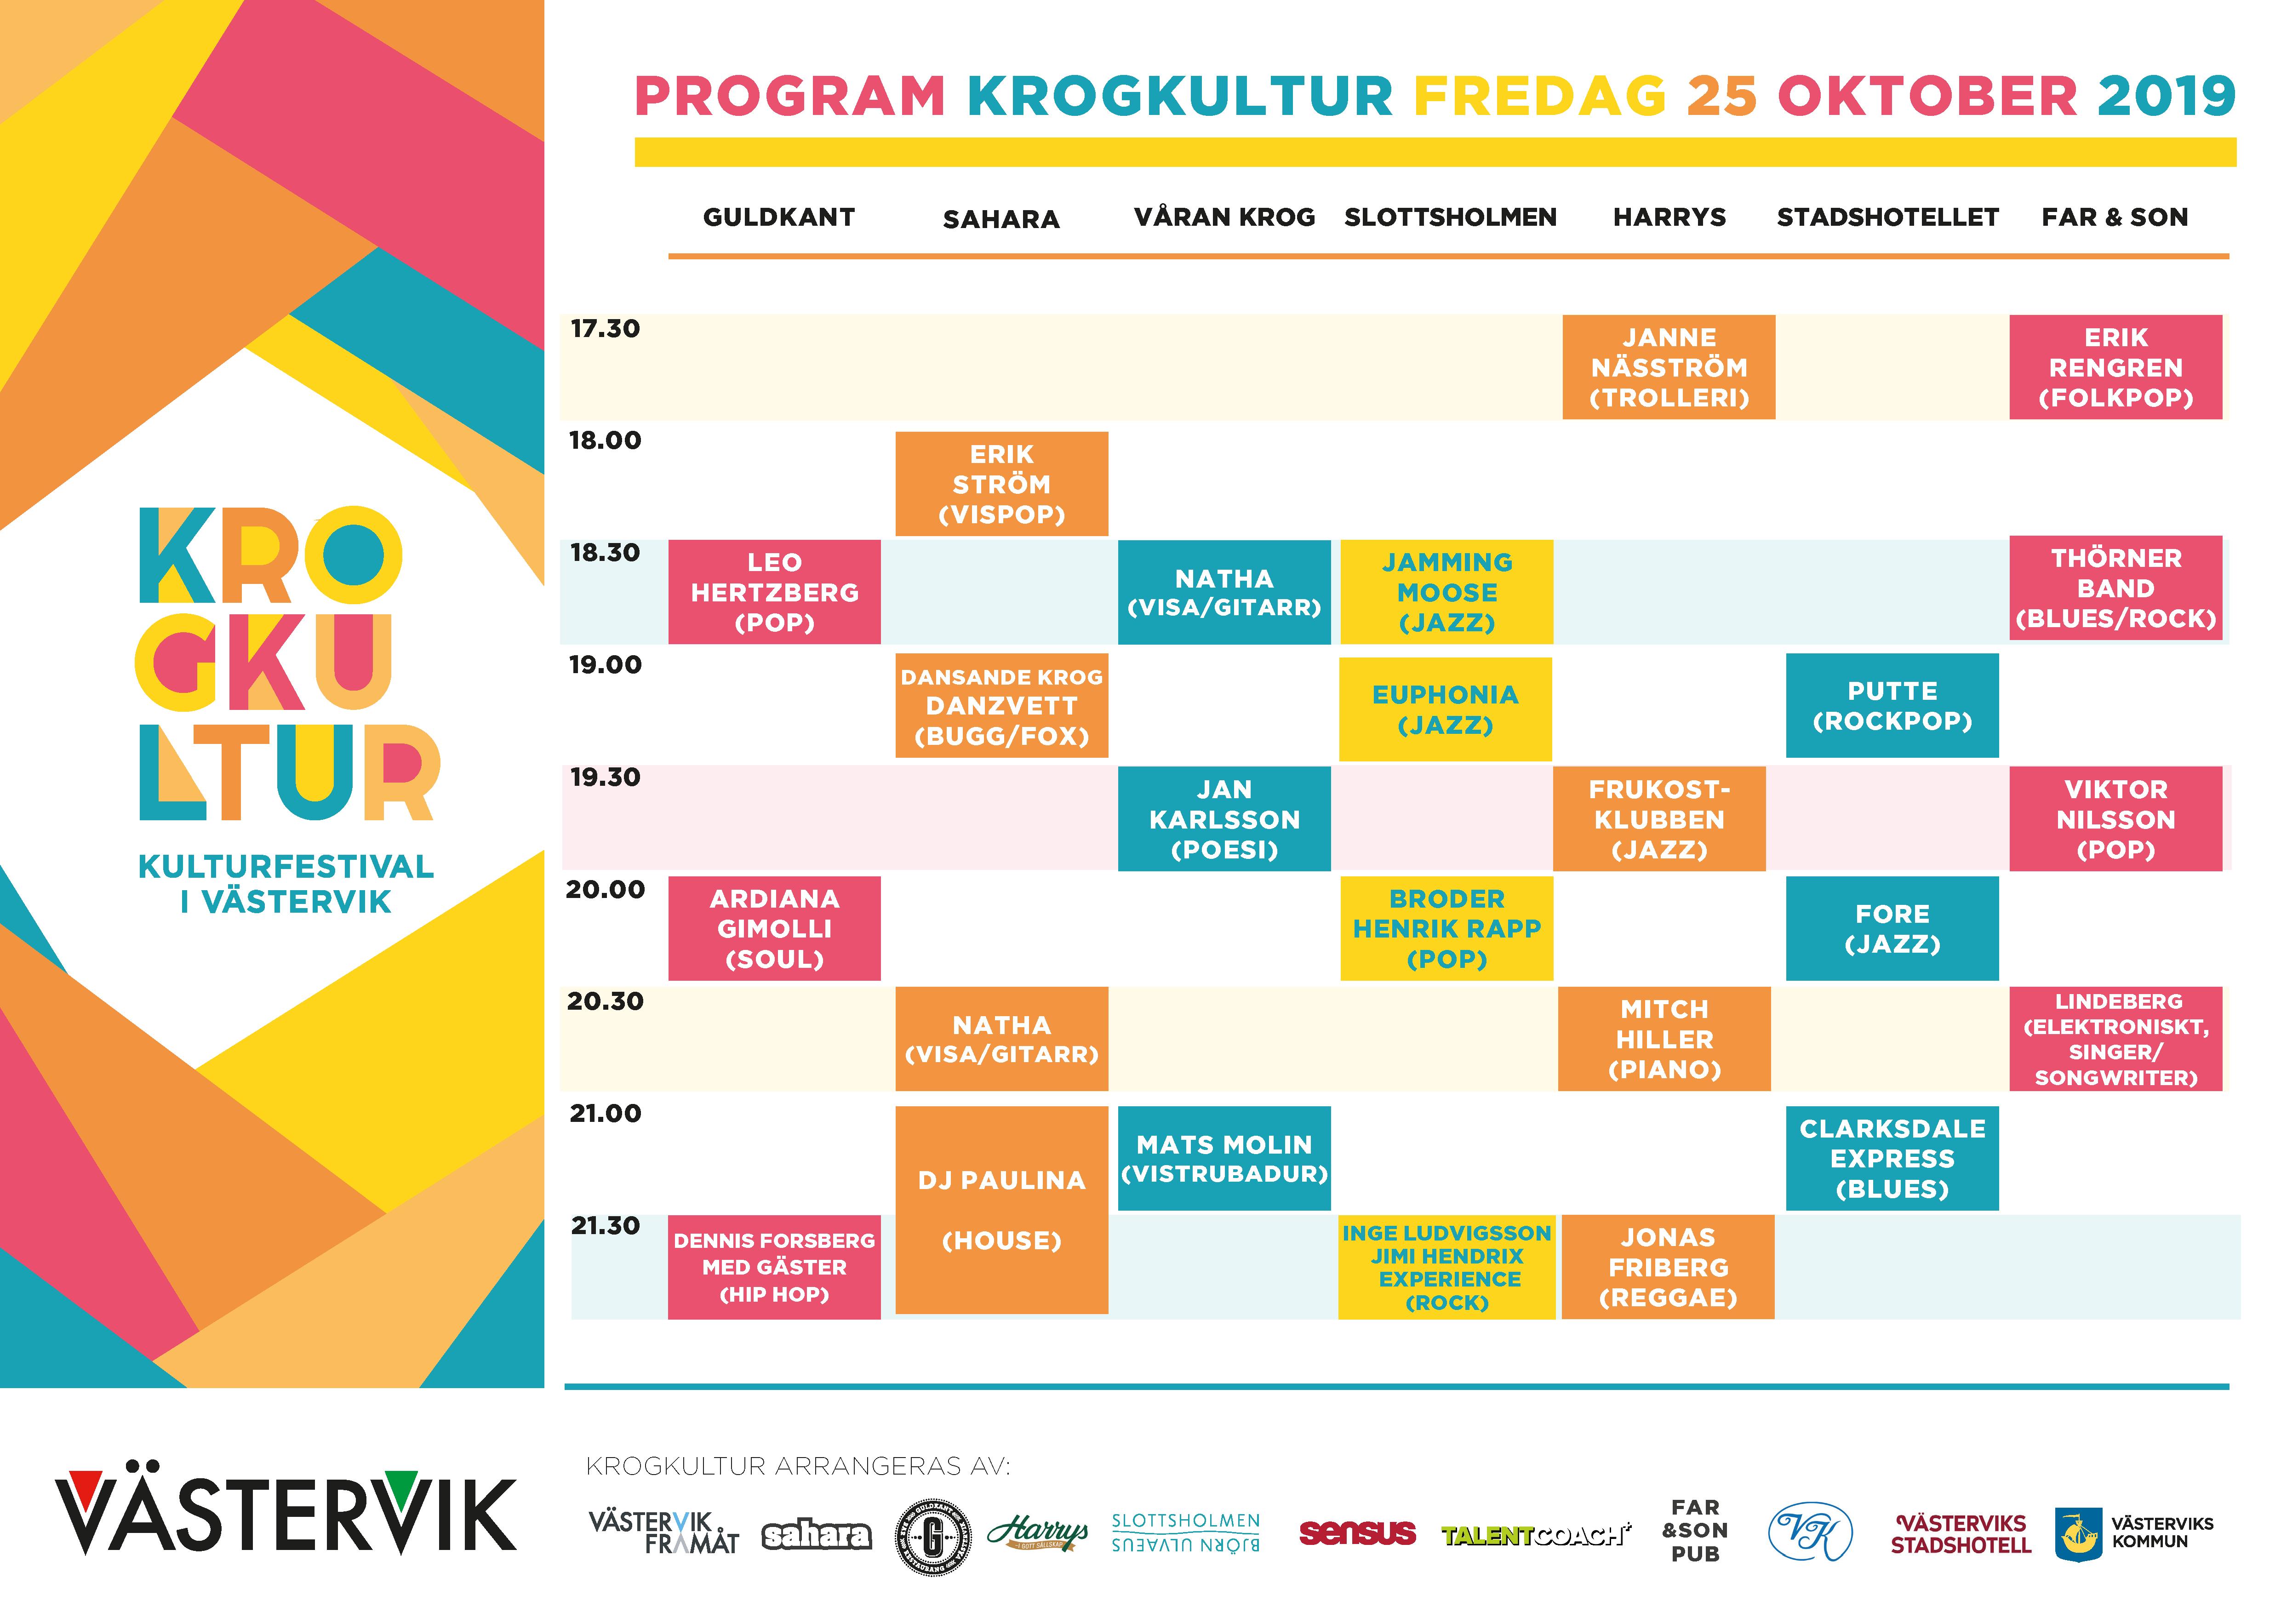 Program Krogkultur 25 OKT 2019 191024